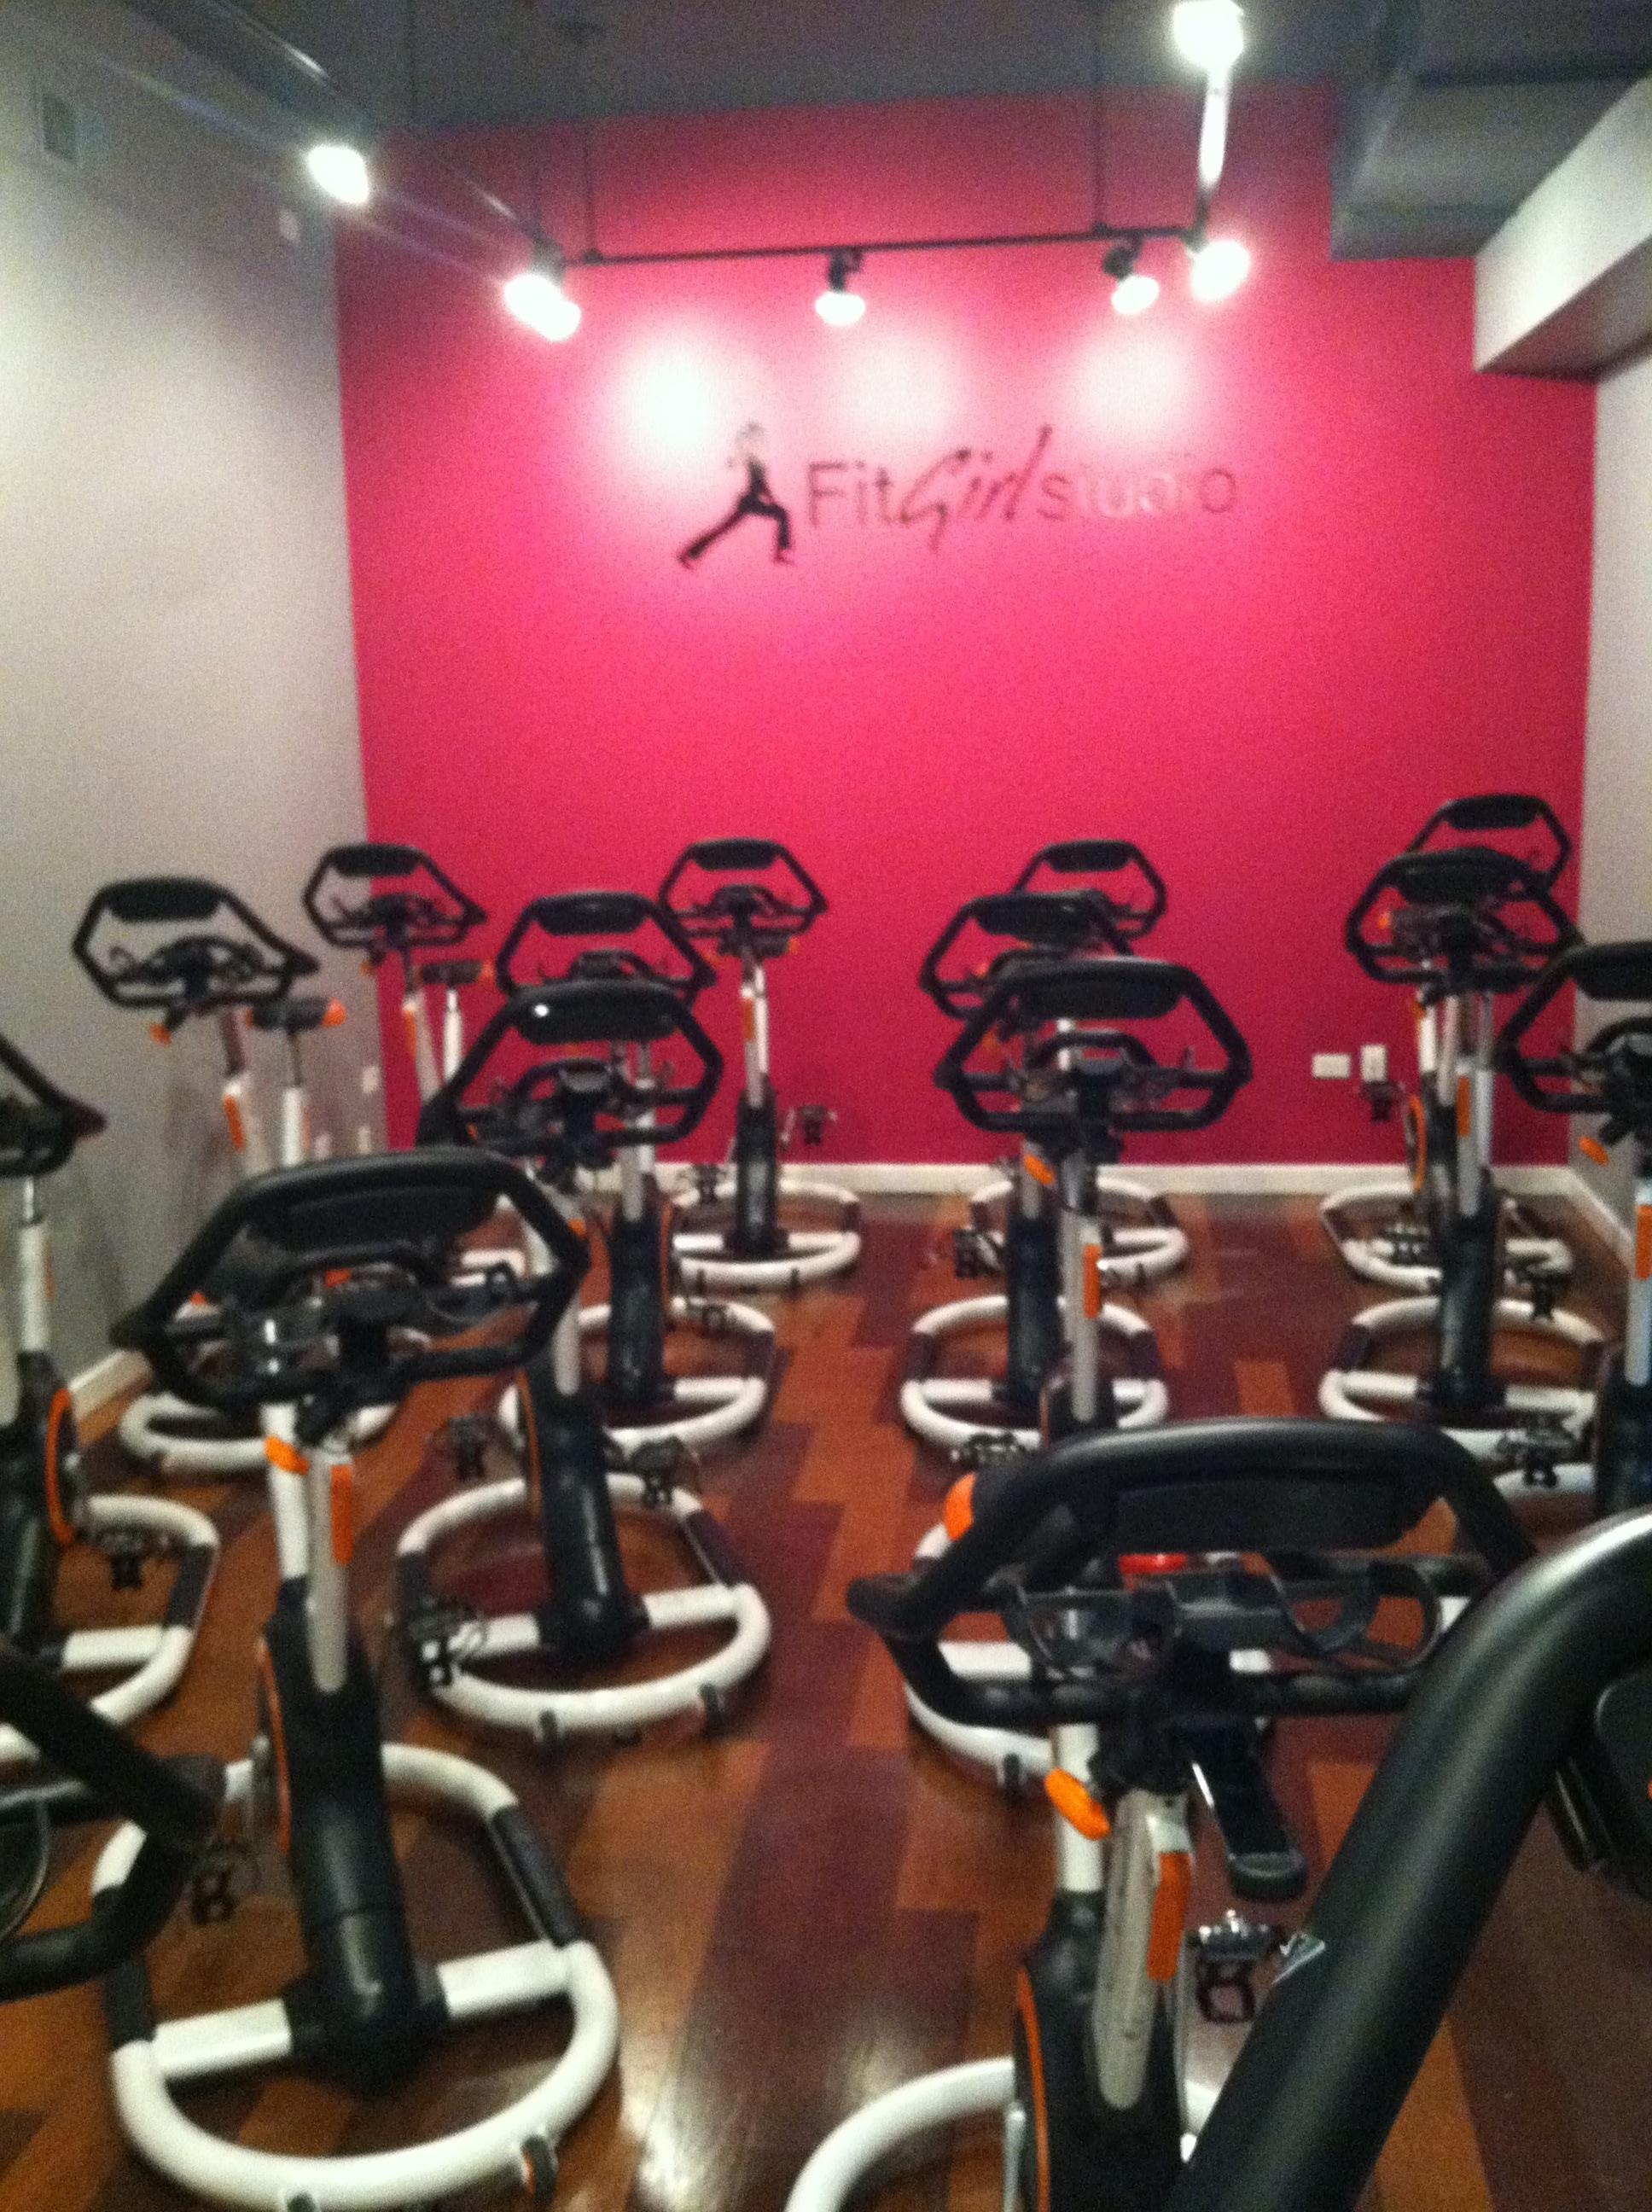 fit girl studio 3